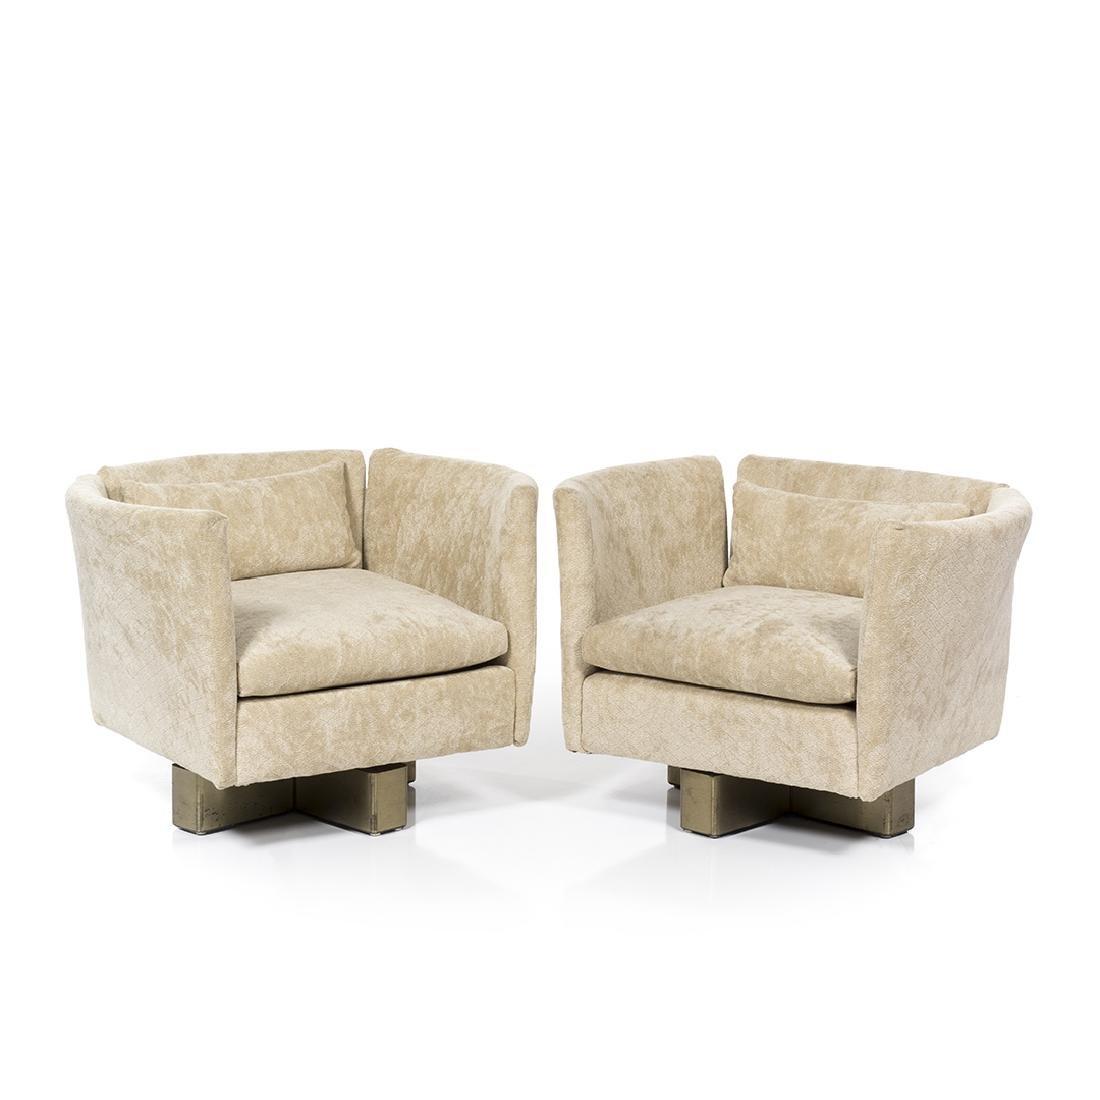 Milo Baughman Style Swivel Club Chairs (2)